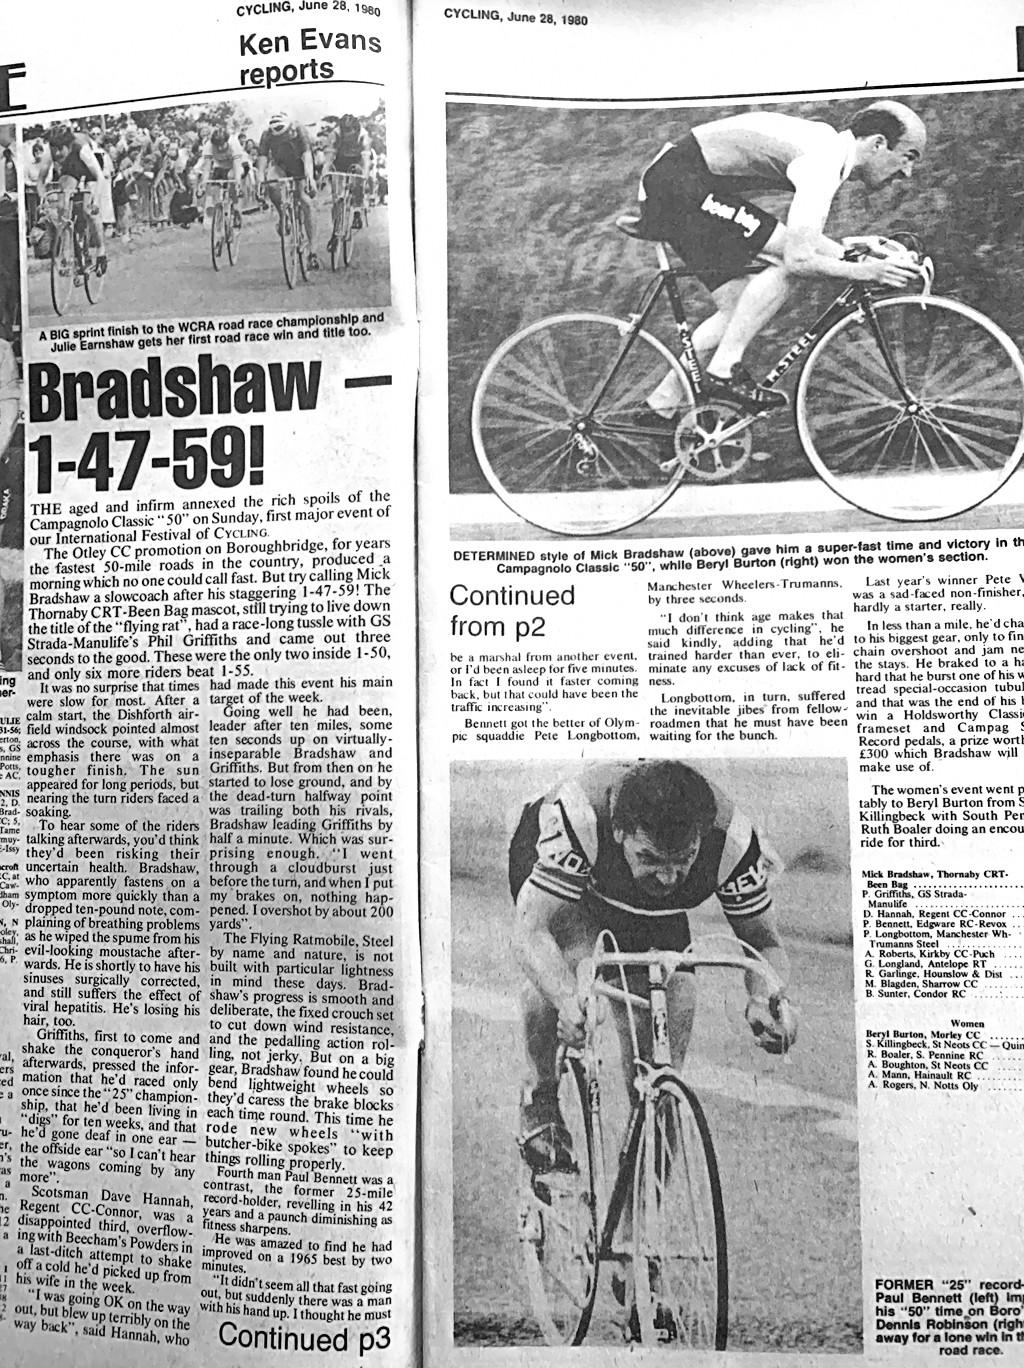 Mick Bradshaw